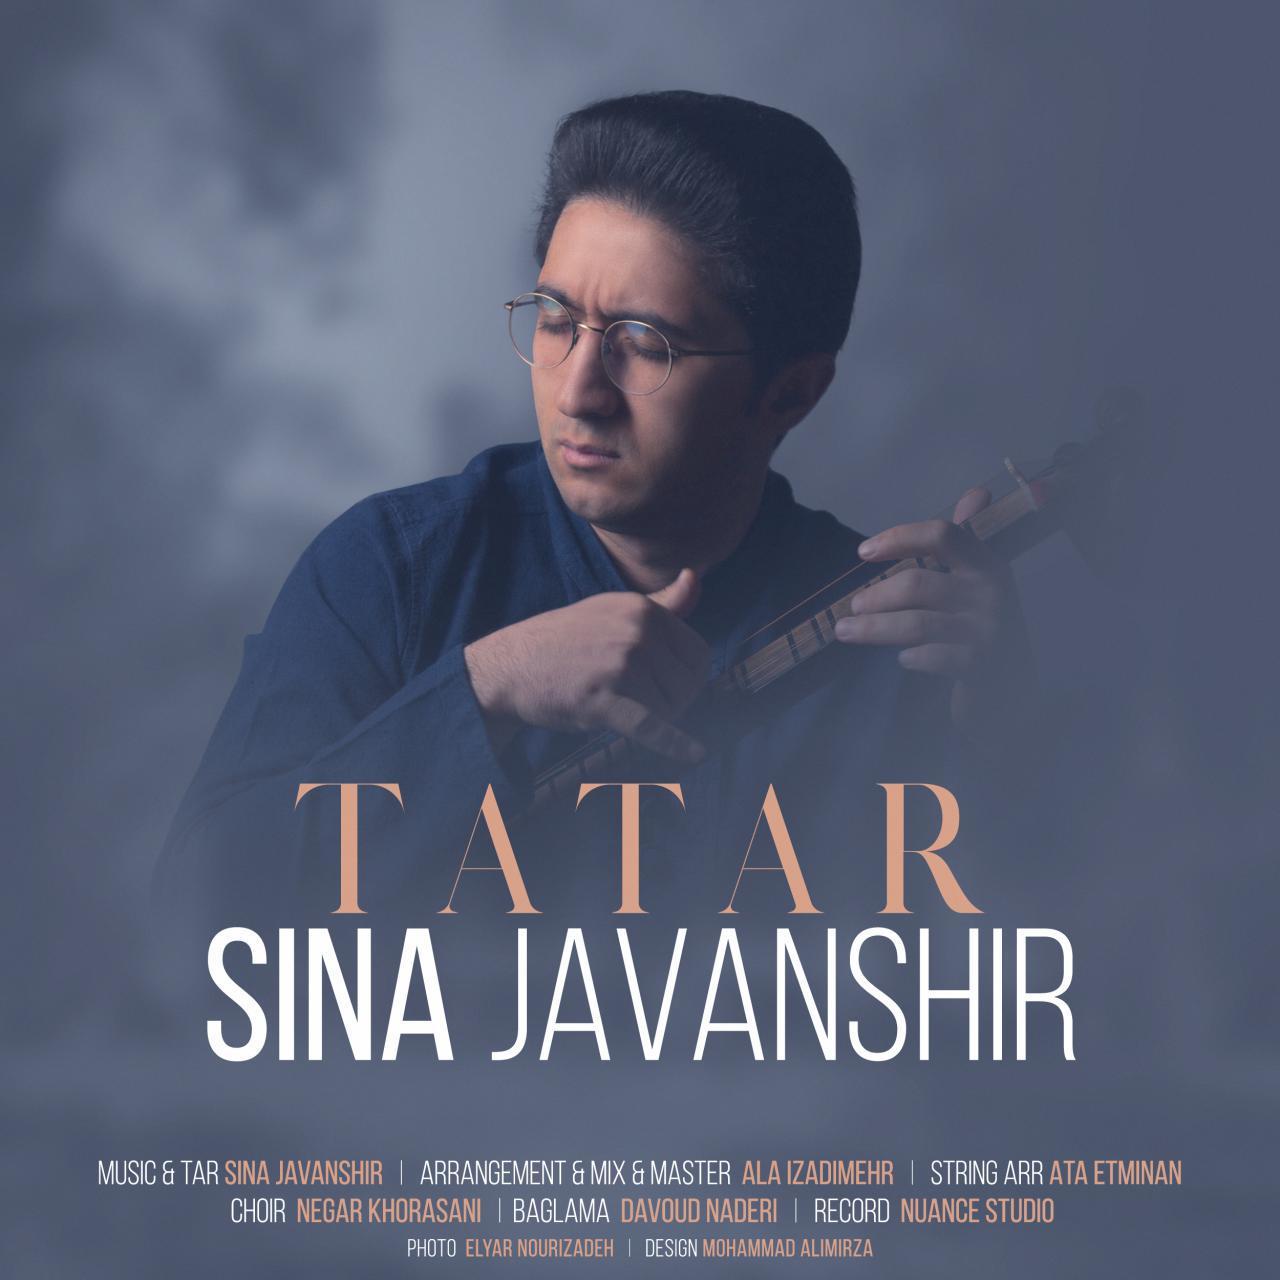 http://birtunes.ir/wp-content/uploads/2018/11/Sina-Javanshir-Tatar.jpg